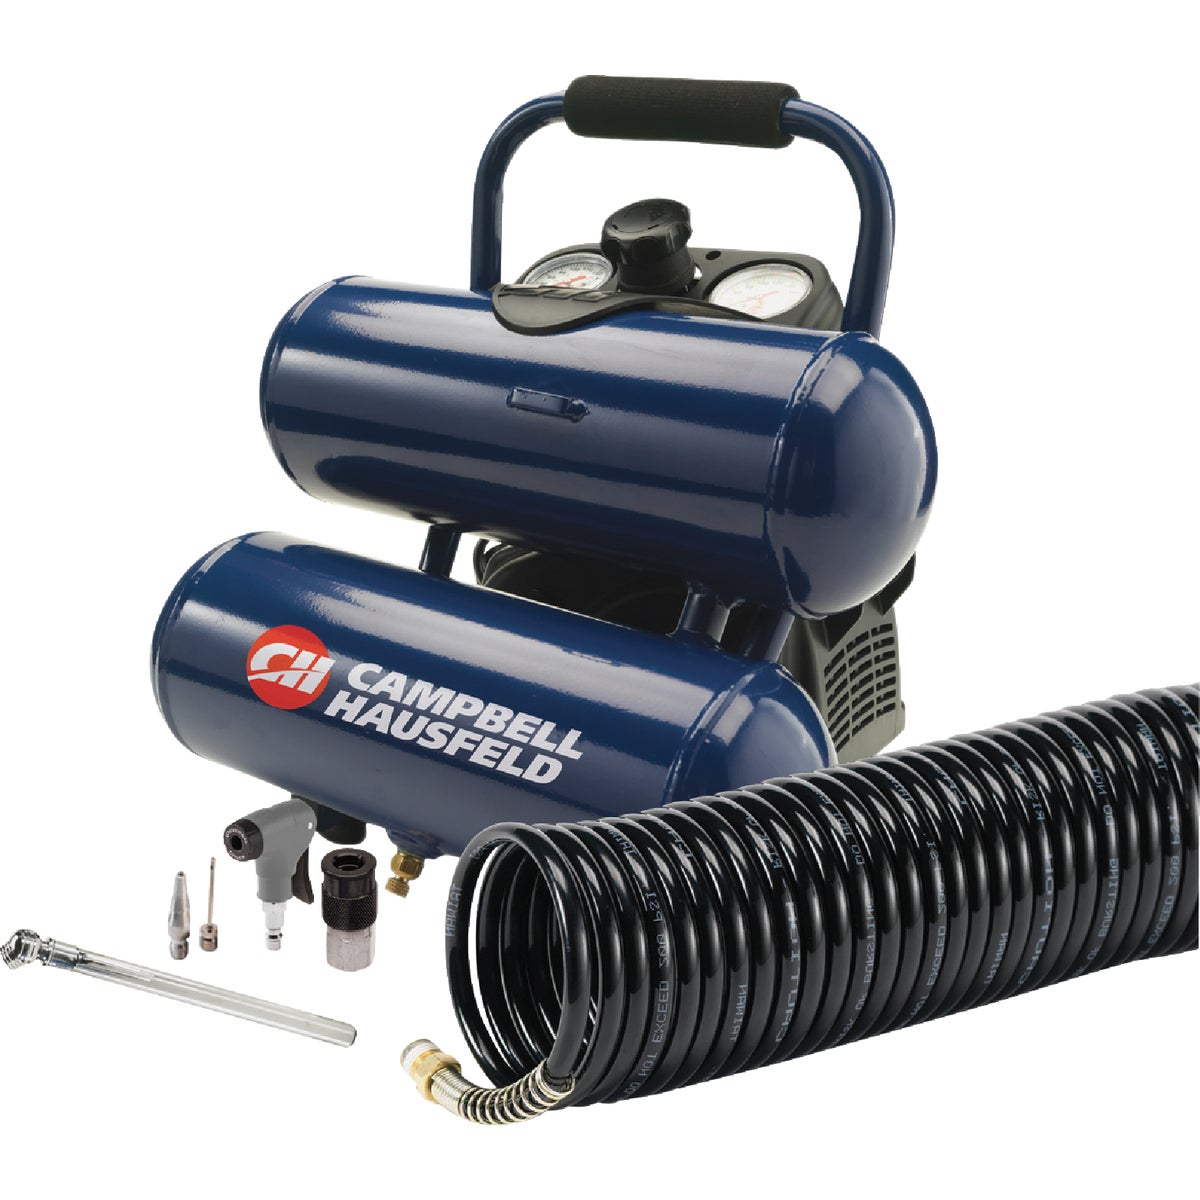 Campbell Hausfeld 2 Gal. Twin-Stack Air Compressor Kit